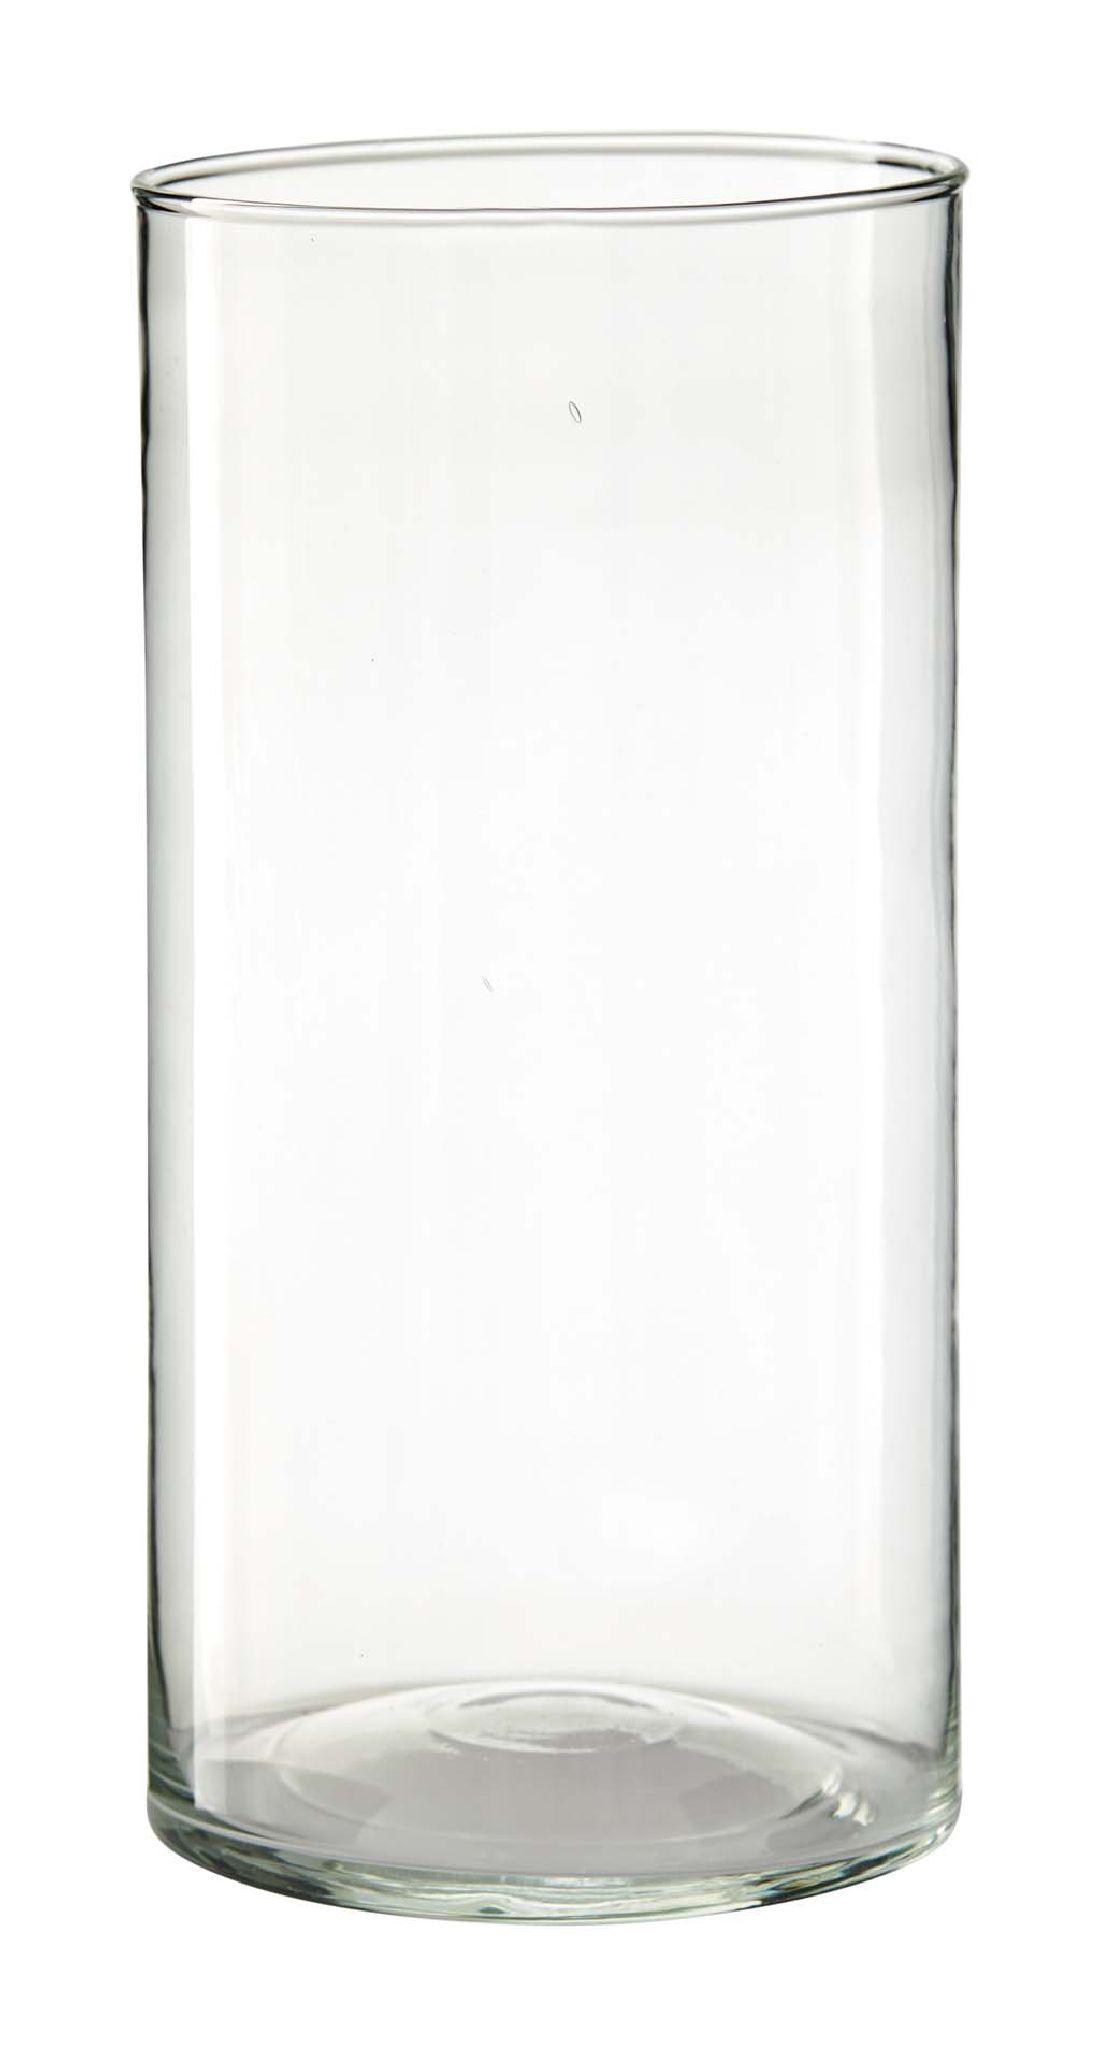 Zylinder Glas KLAR 1851/20 Ø15xh20cm